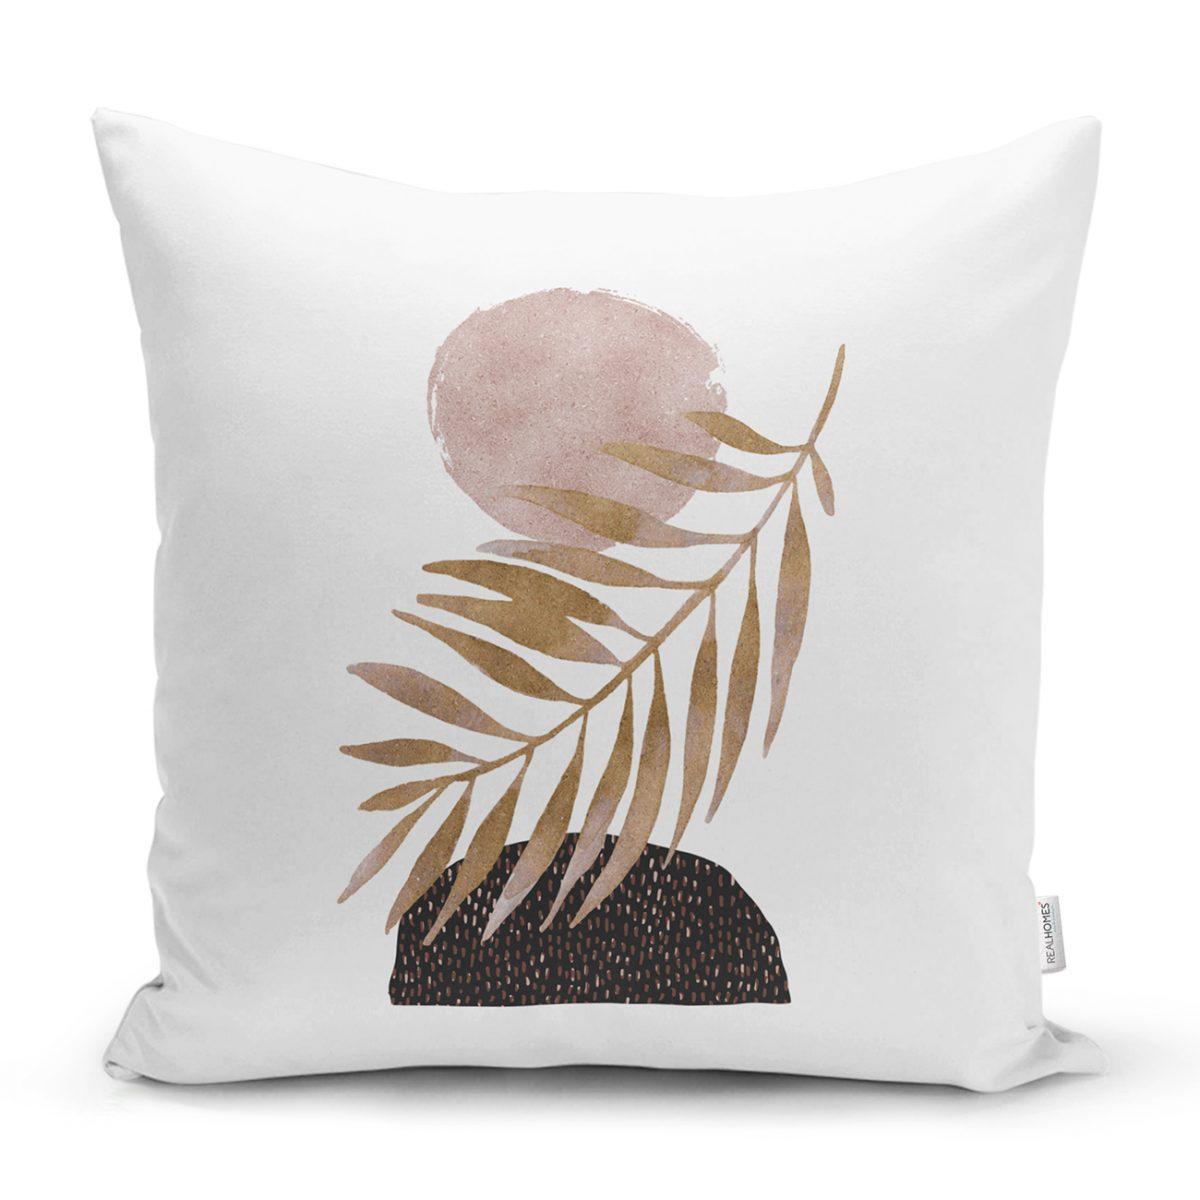 Beyaz Zeminde Soyut Çizim Ay Ve Yaprak Motifli Kırlent Kılıfı Realhomes